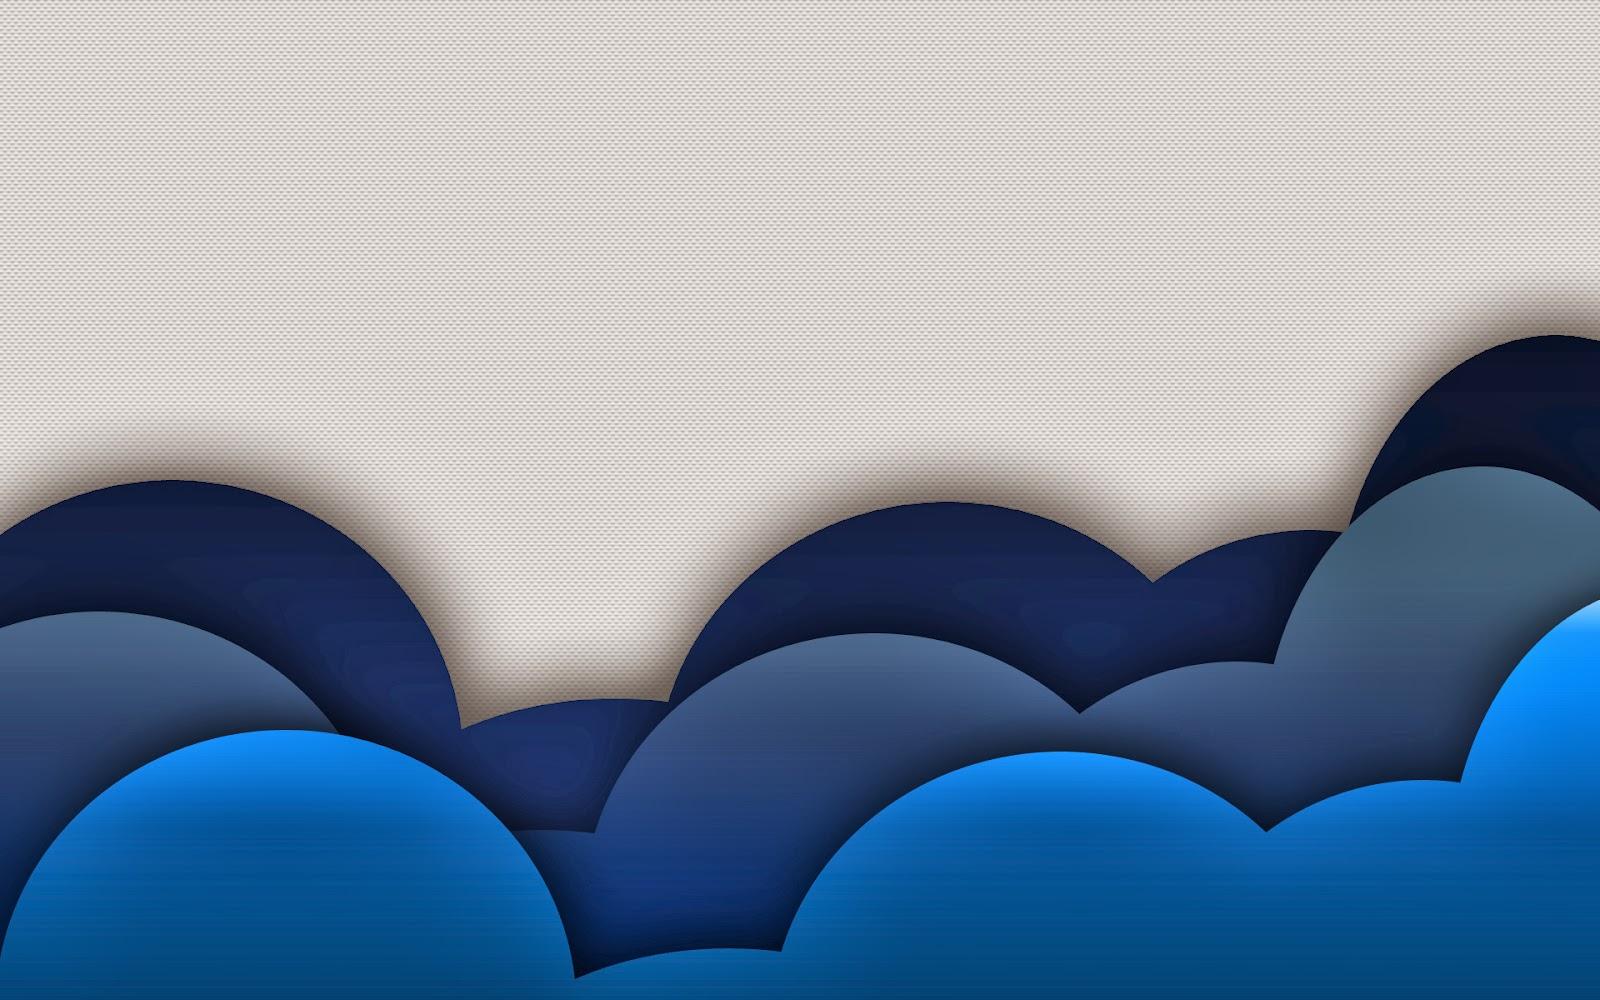 Desktop HD Wallpapers: Website Background Themes